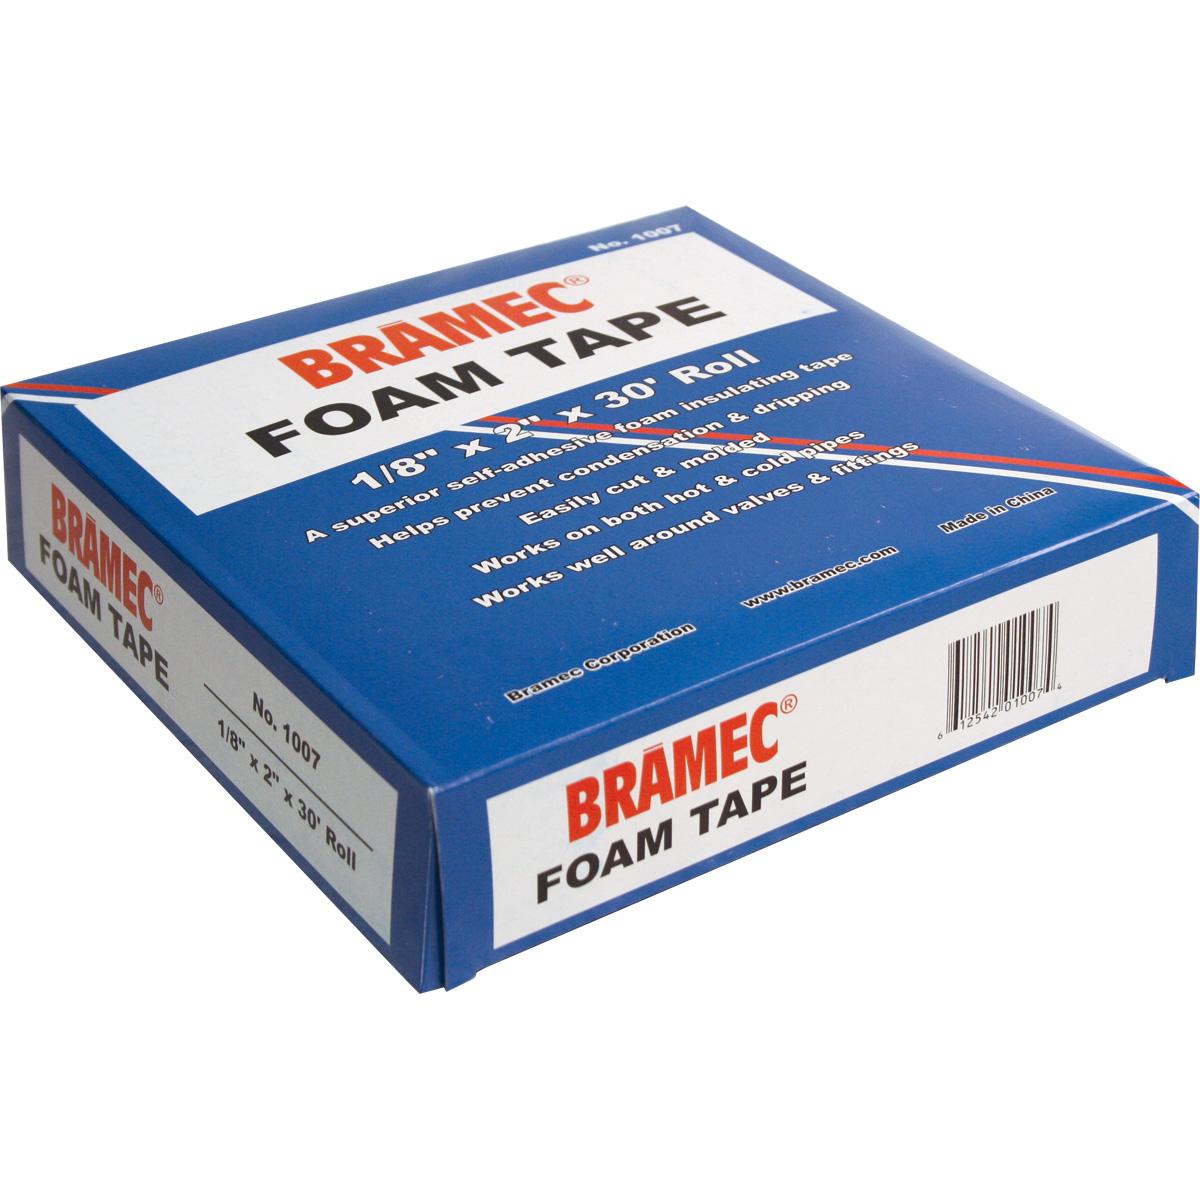 Bramec foam tape.